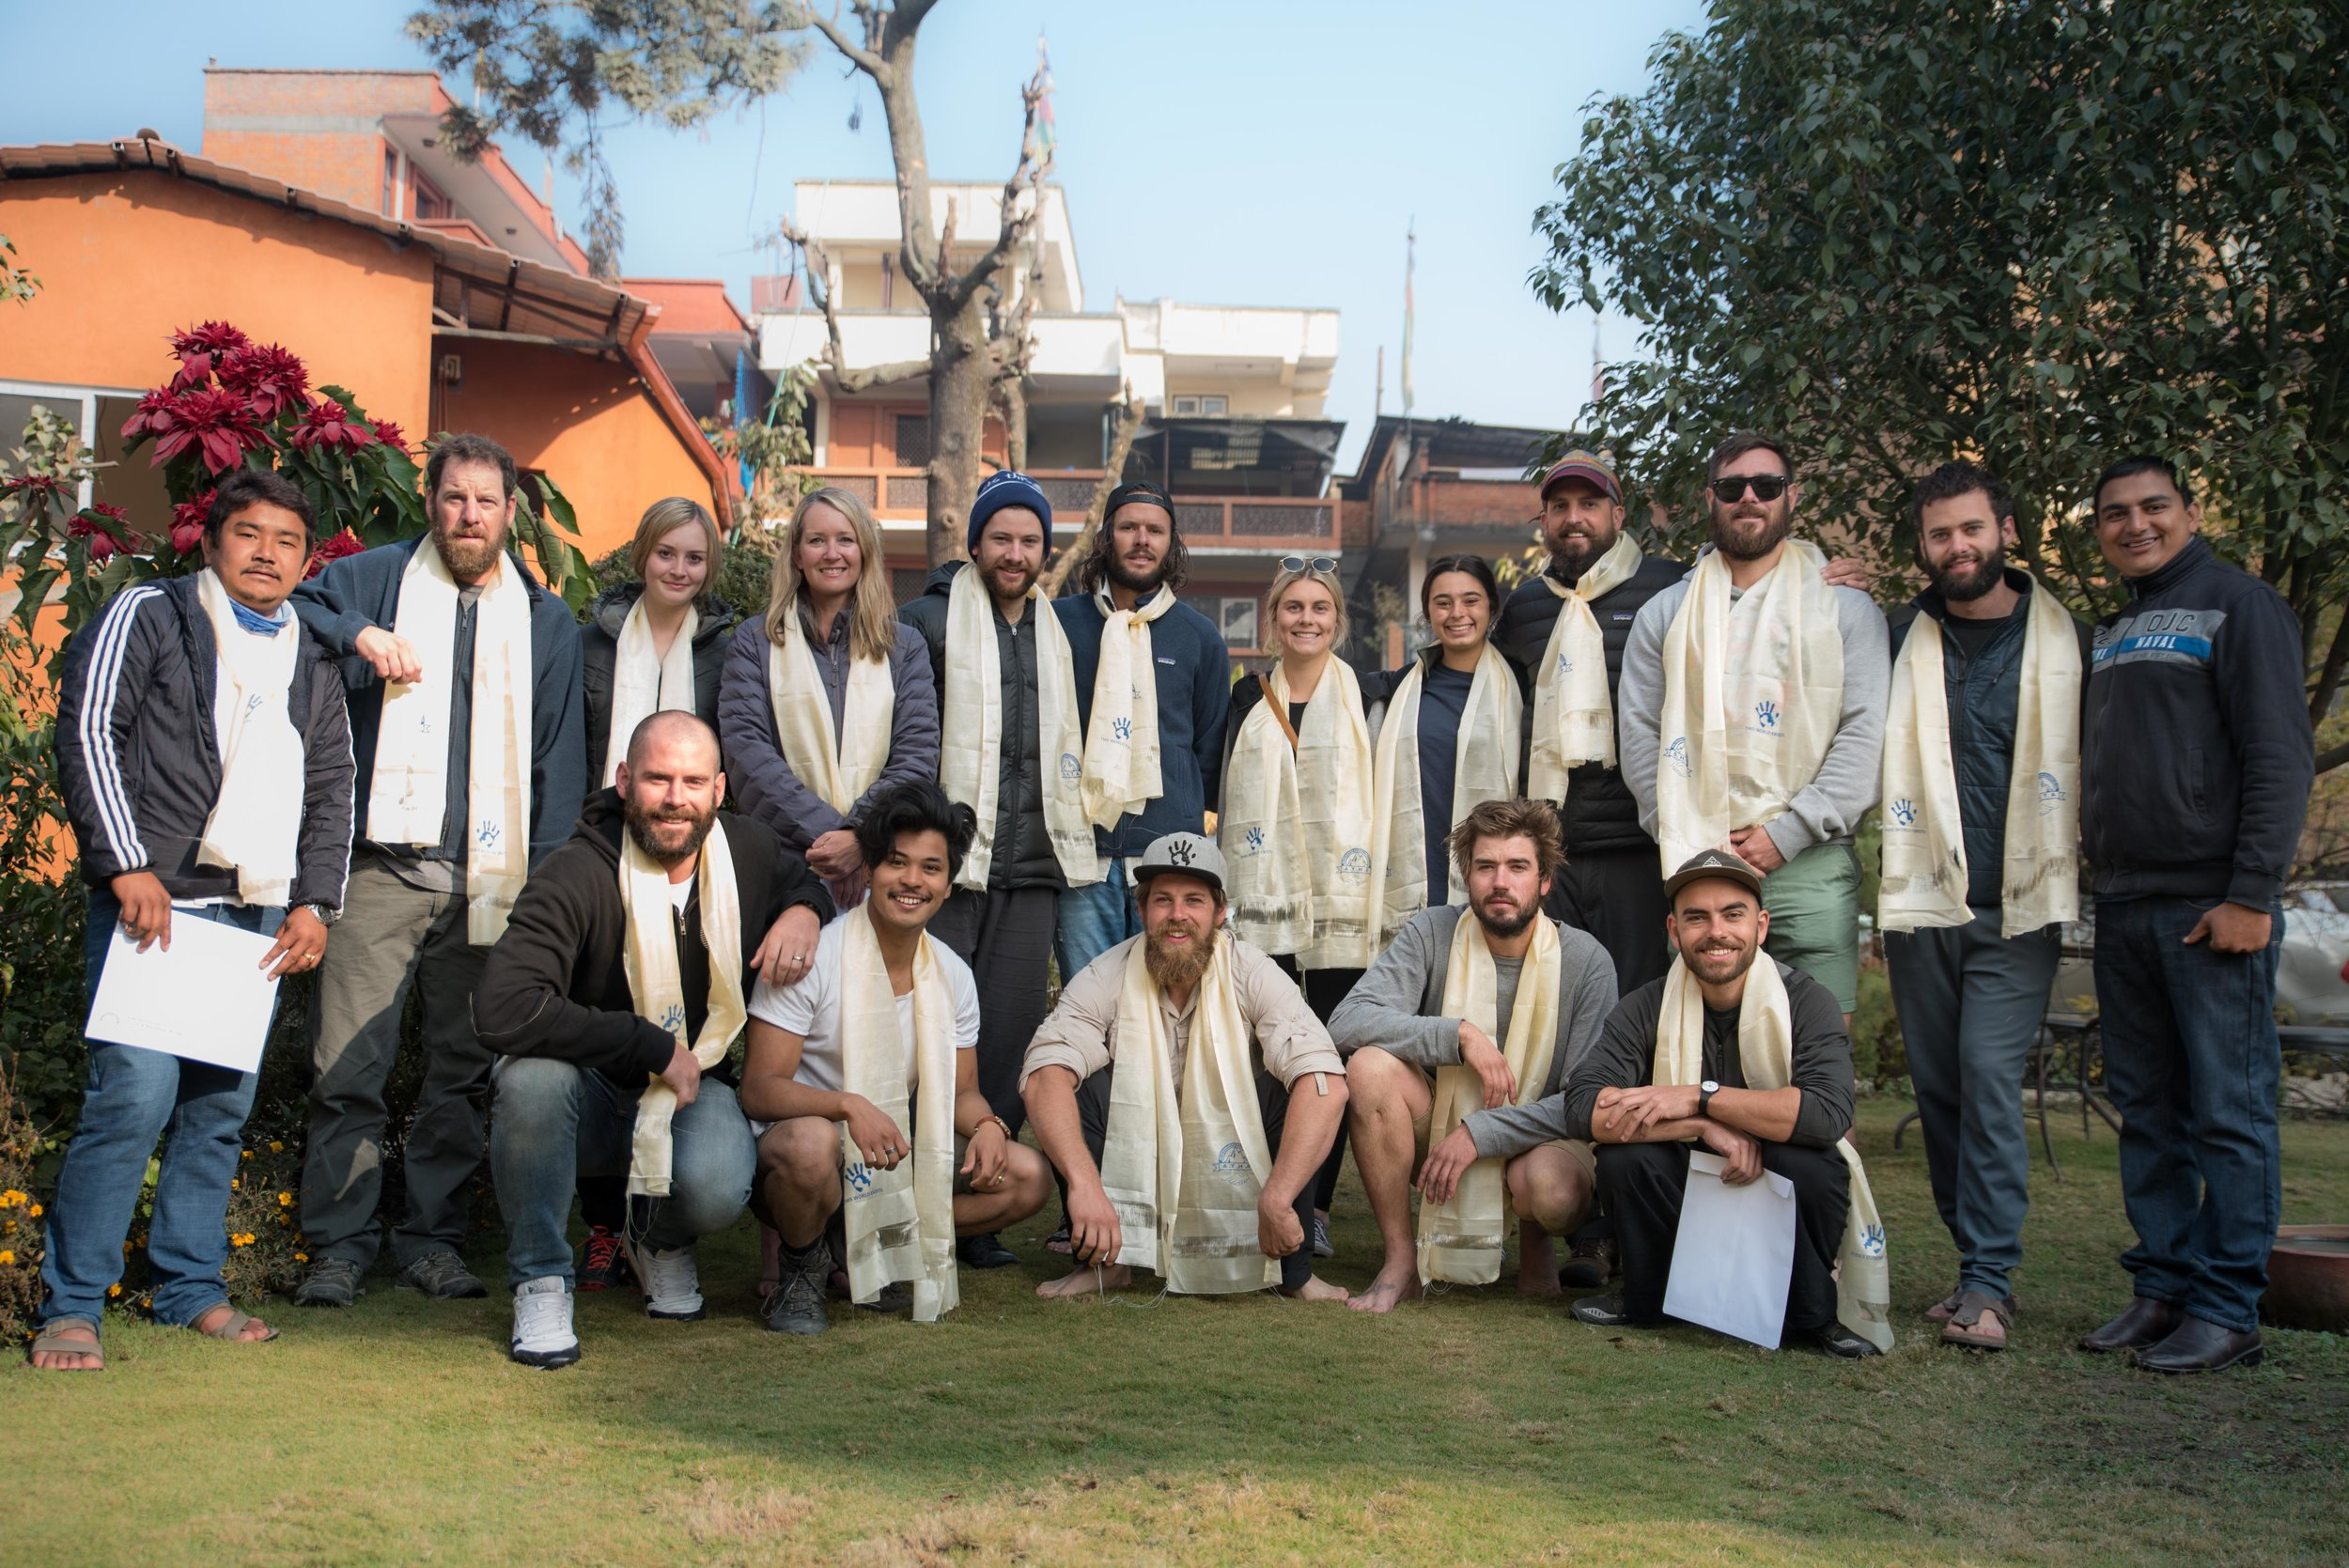 The January THISWORLDEXISTS group in Kathmandu, Nepal. PC @ryangraymedia